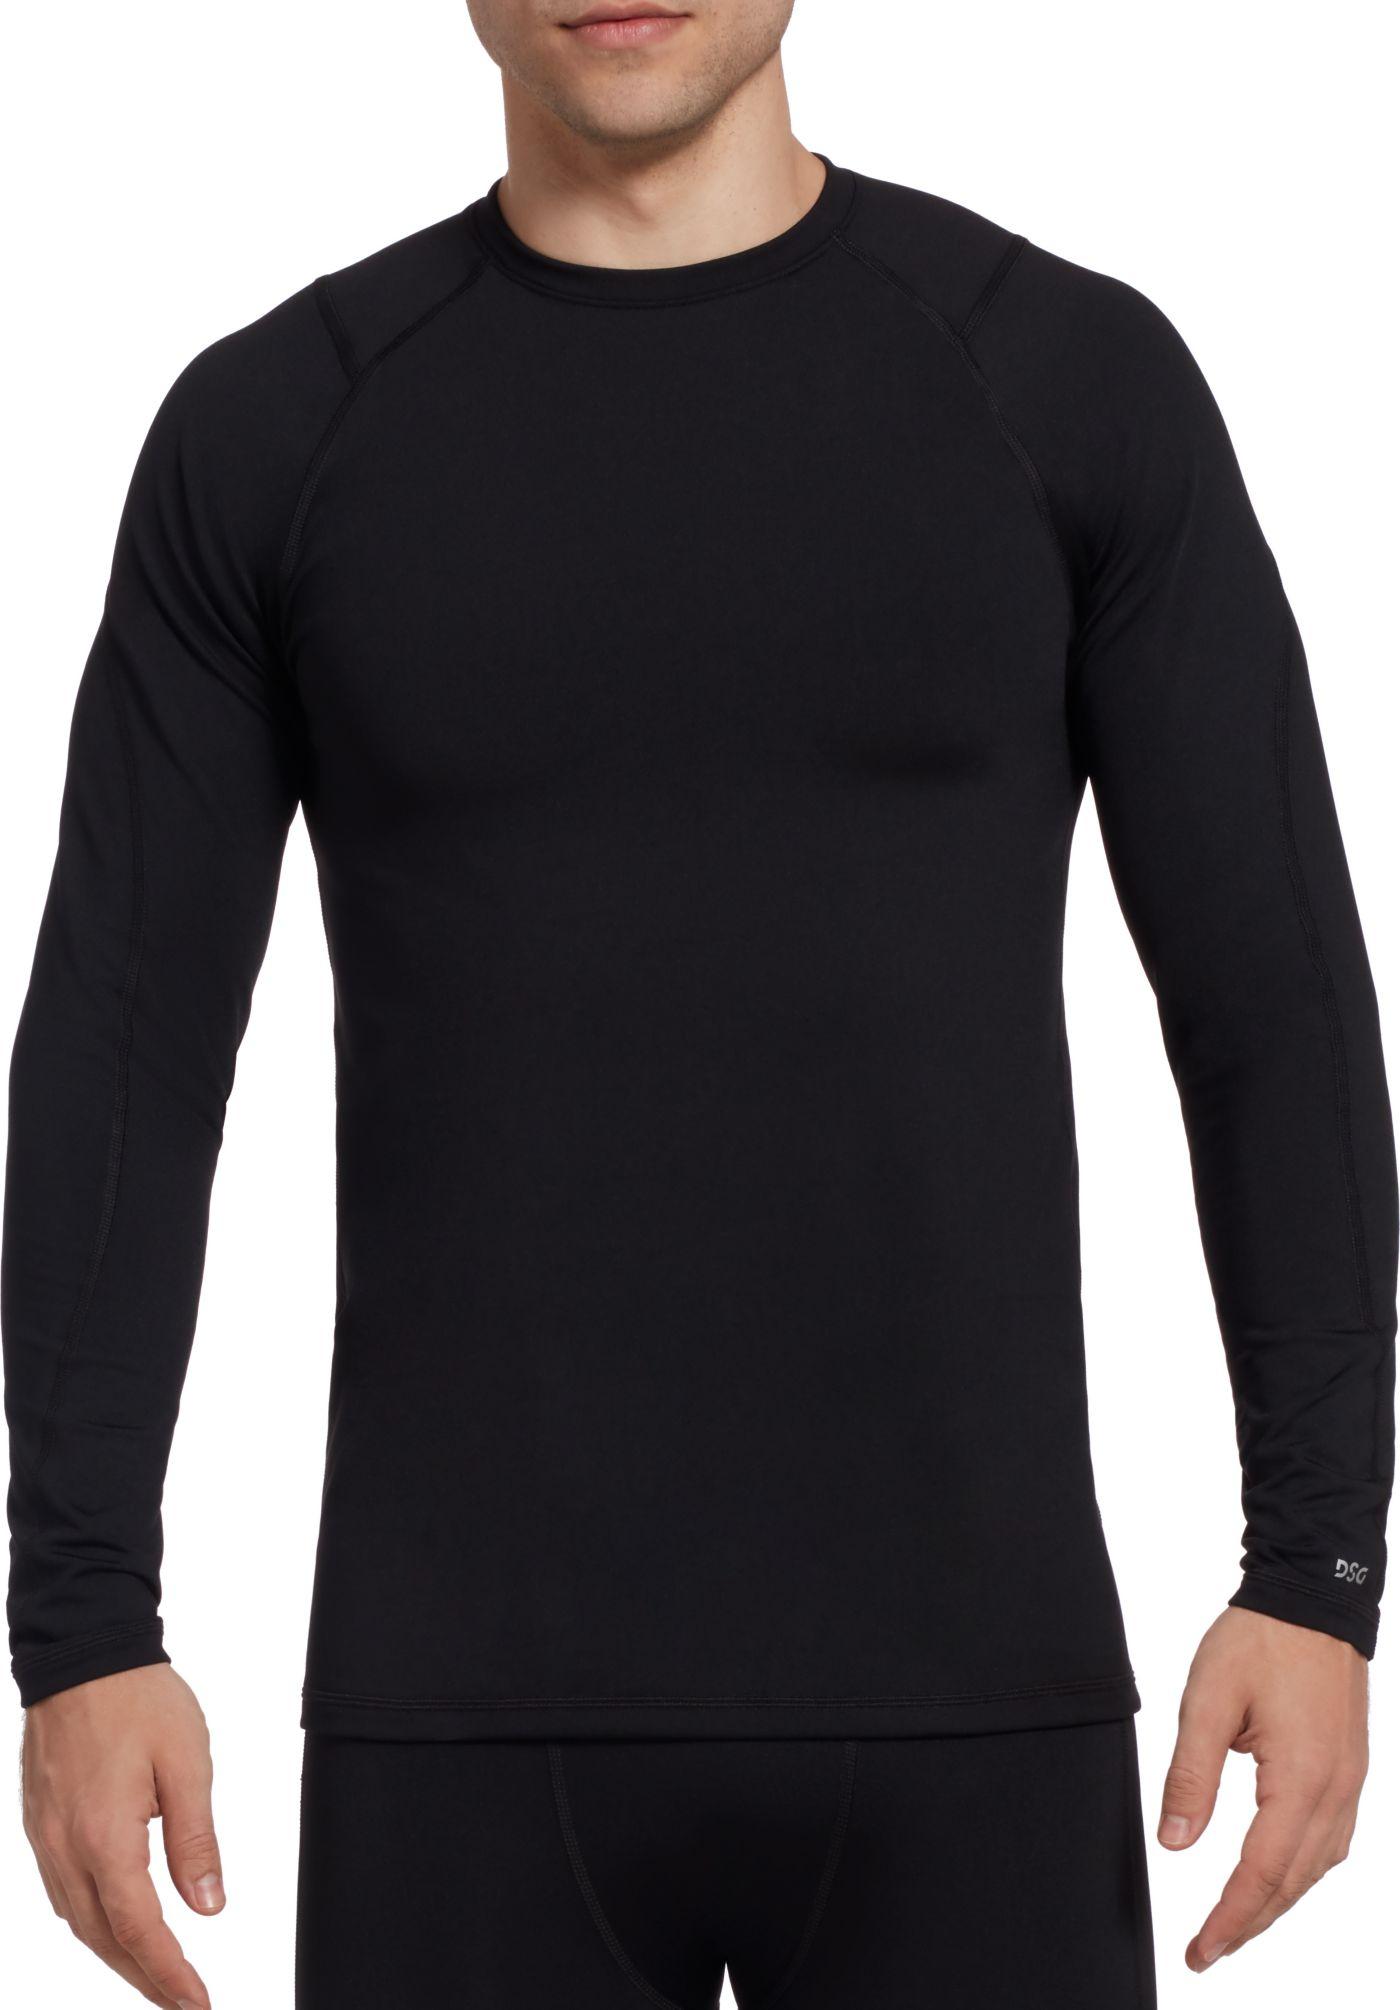 DSG Men's Cold Weather Crewneck Long Sleeve Shirt